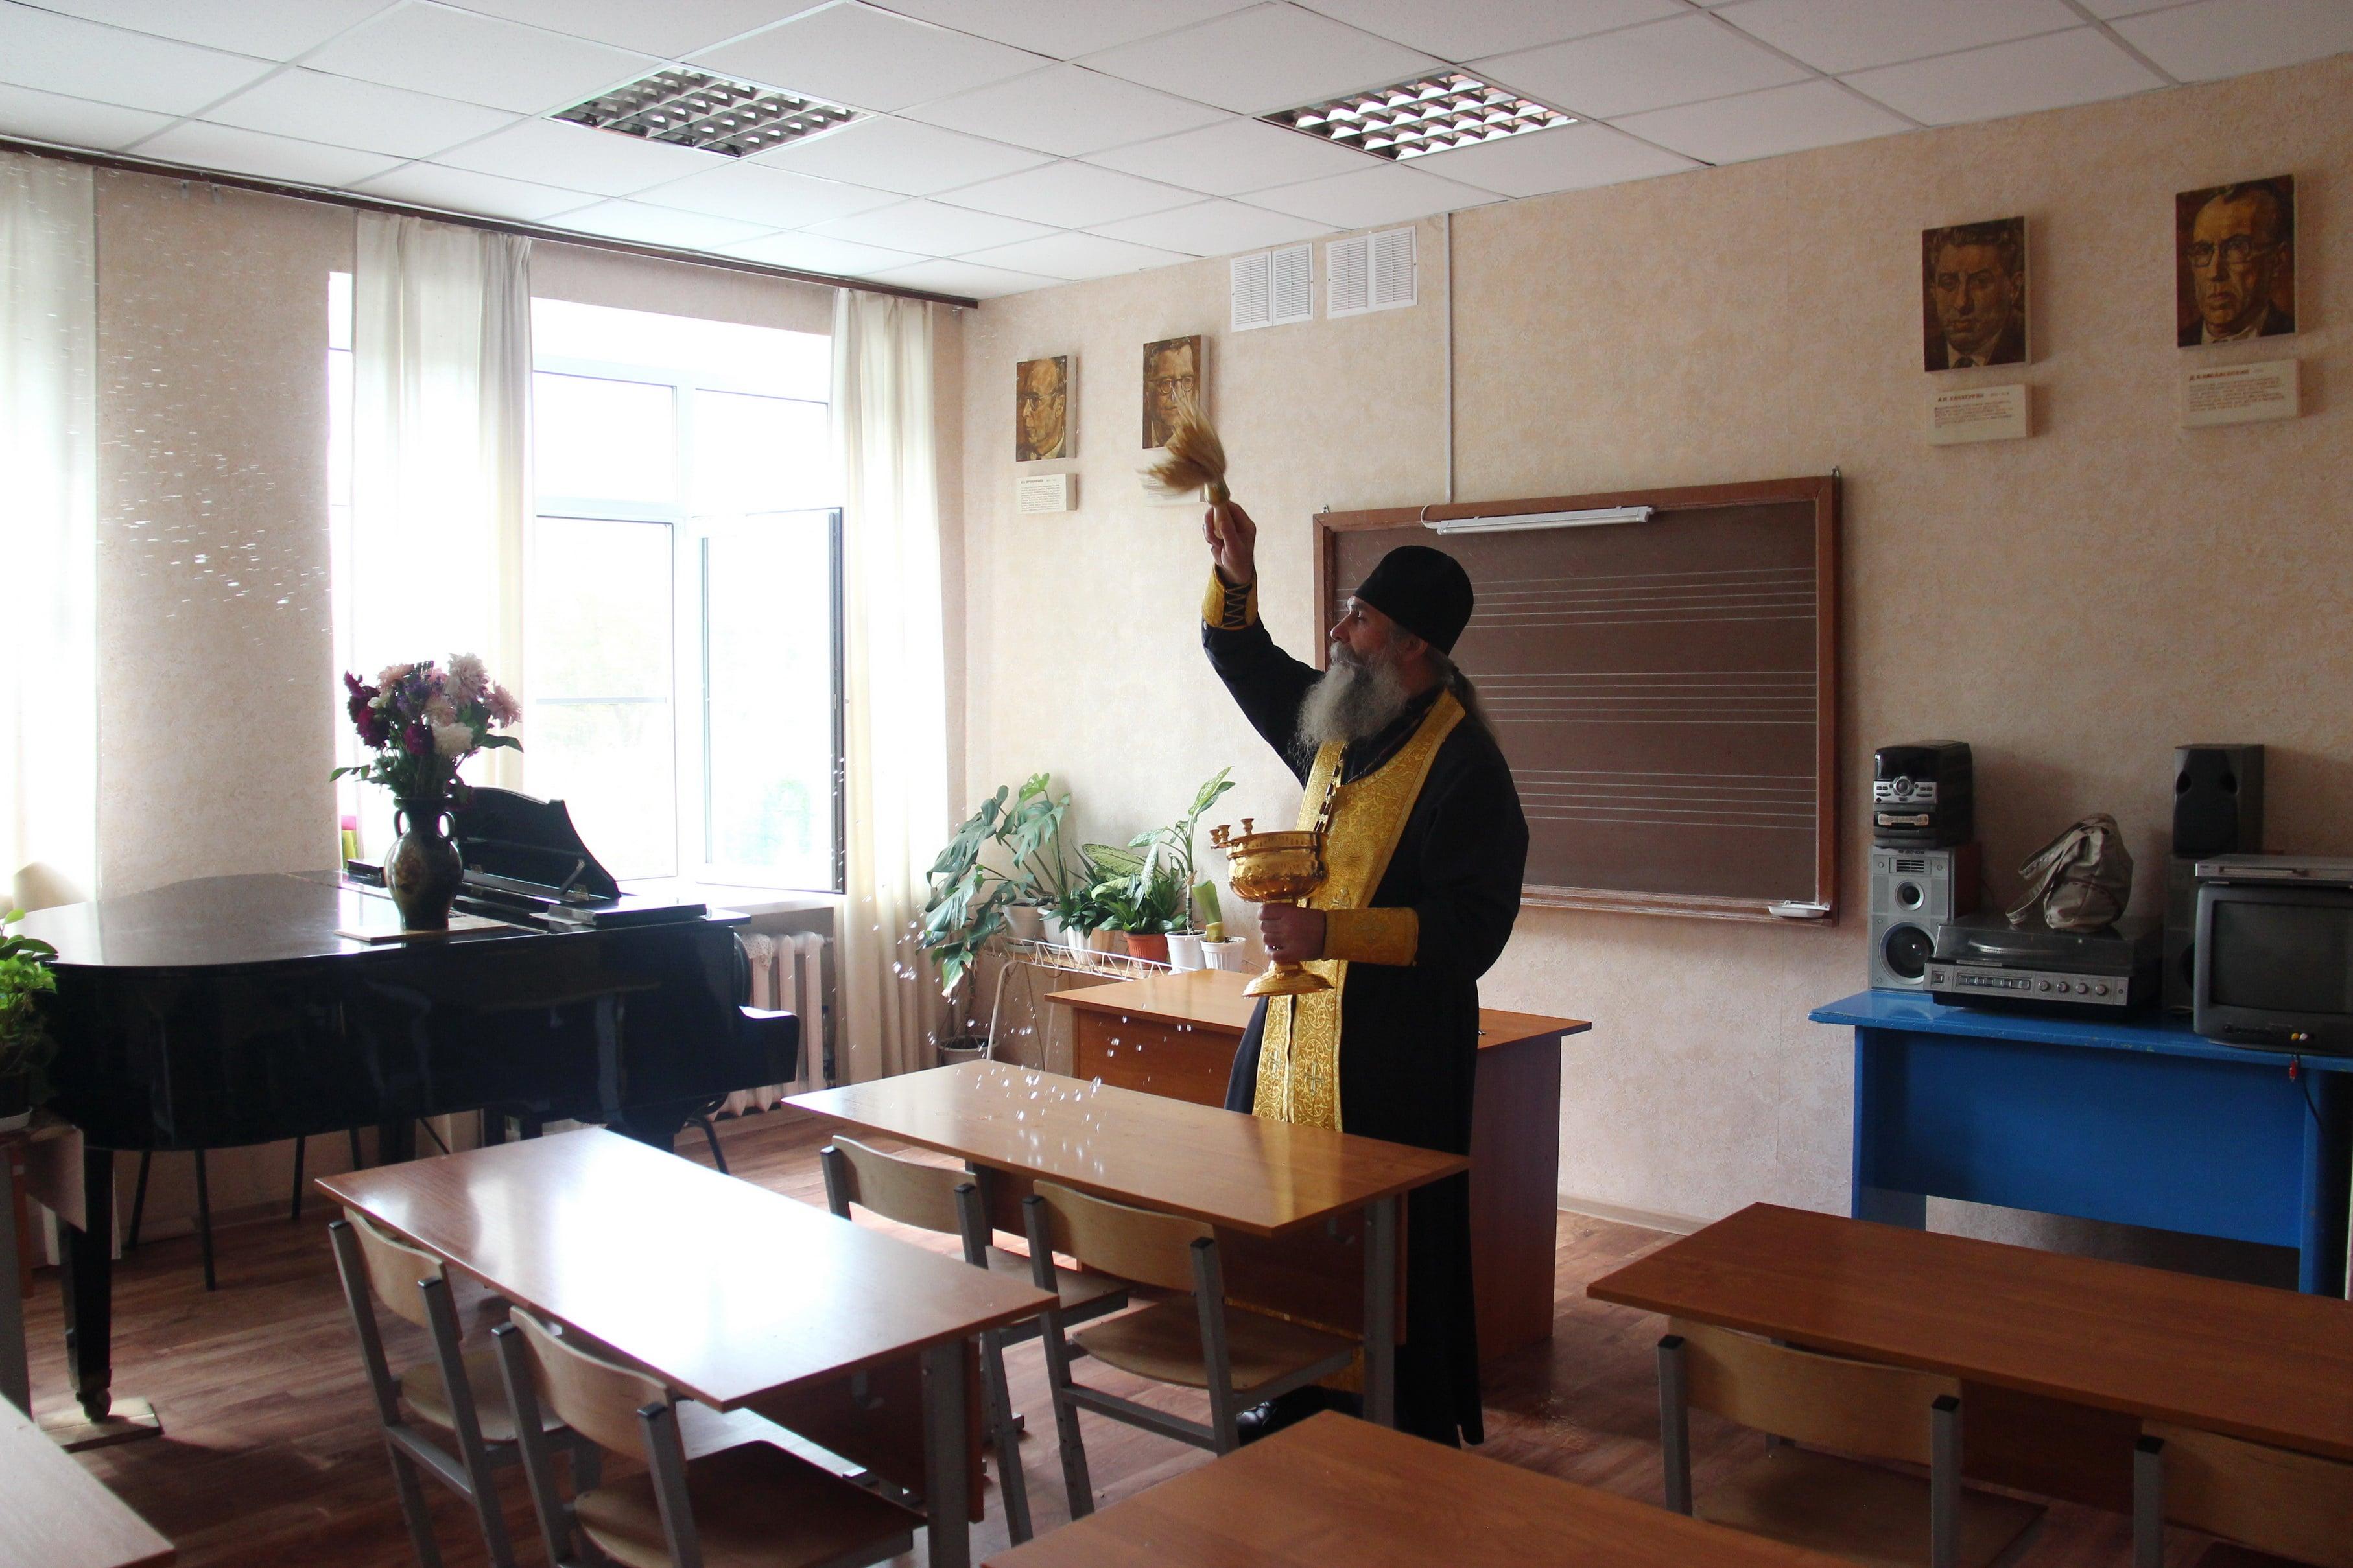 http://monuspen.ru/photoreports/ae2bc2fe1b9cb7c14934f79613c4200g.JPG